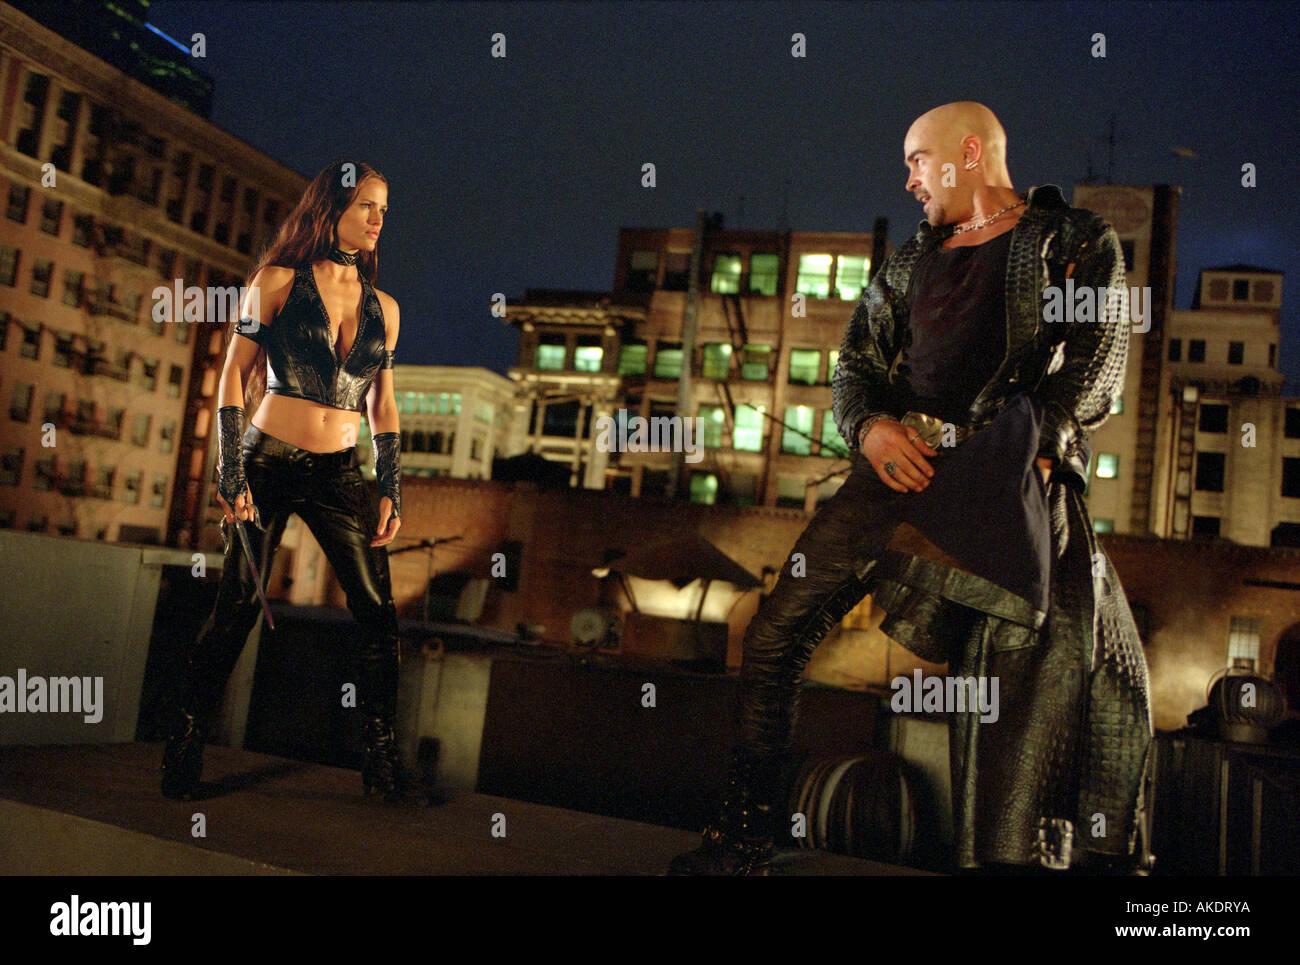 DAREDEVIL 2003 TCF film with Jennifer Garner and Colin Farrell - Stock Image